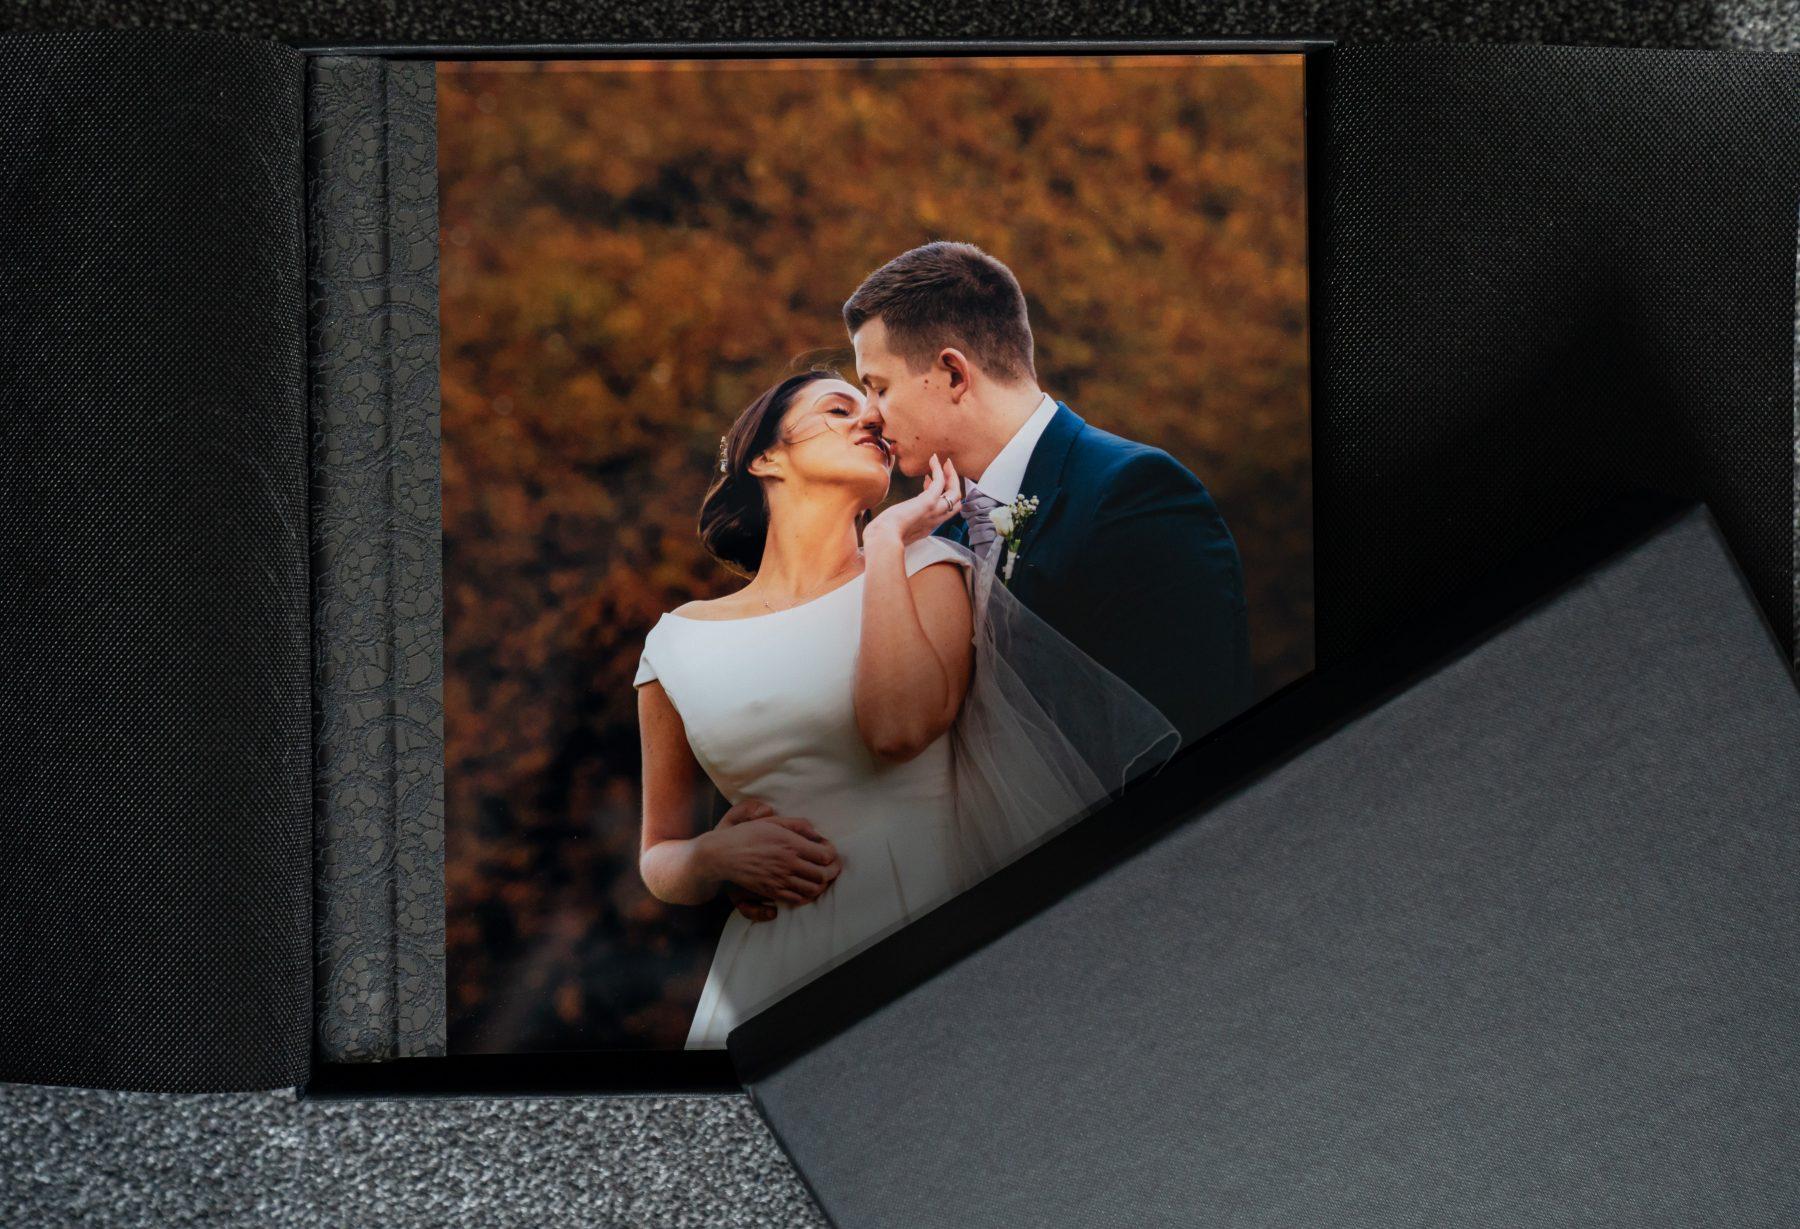 The cover of an acrylic wedding album